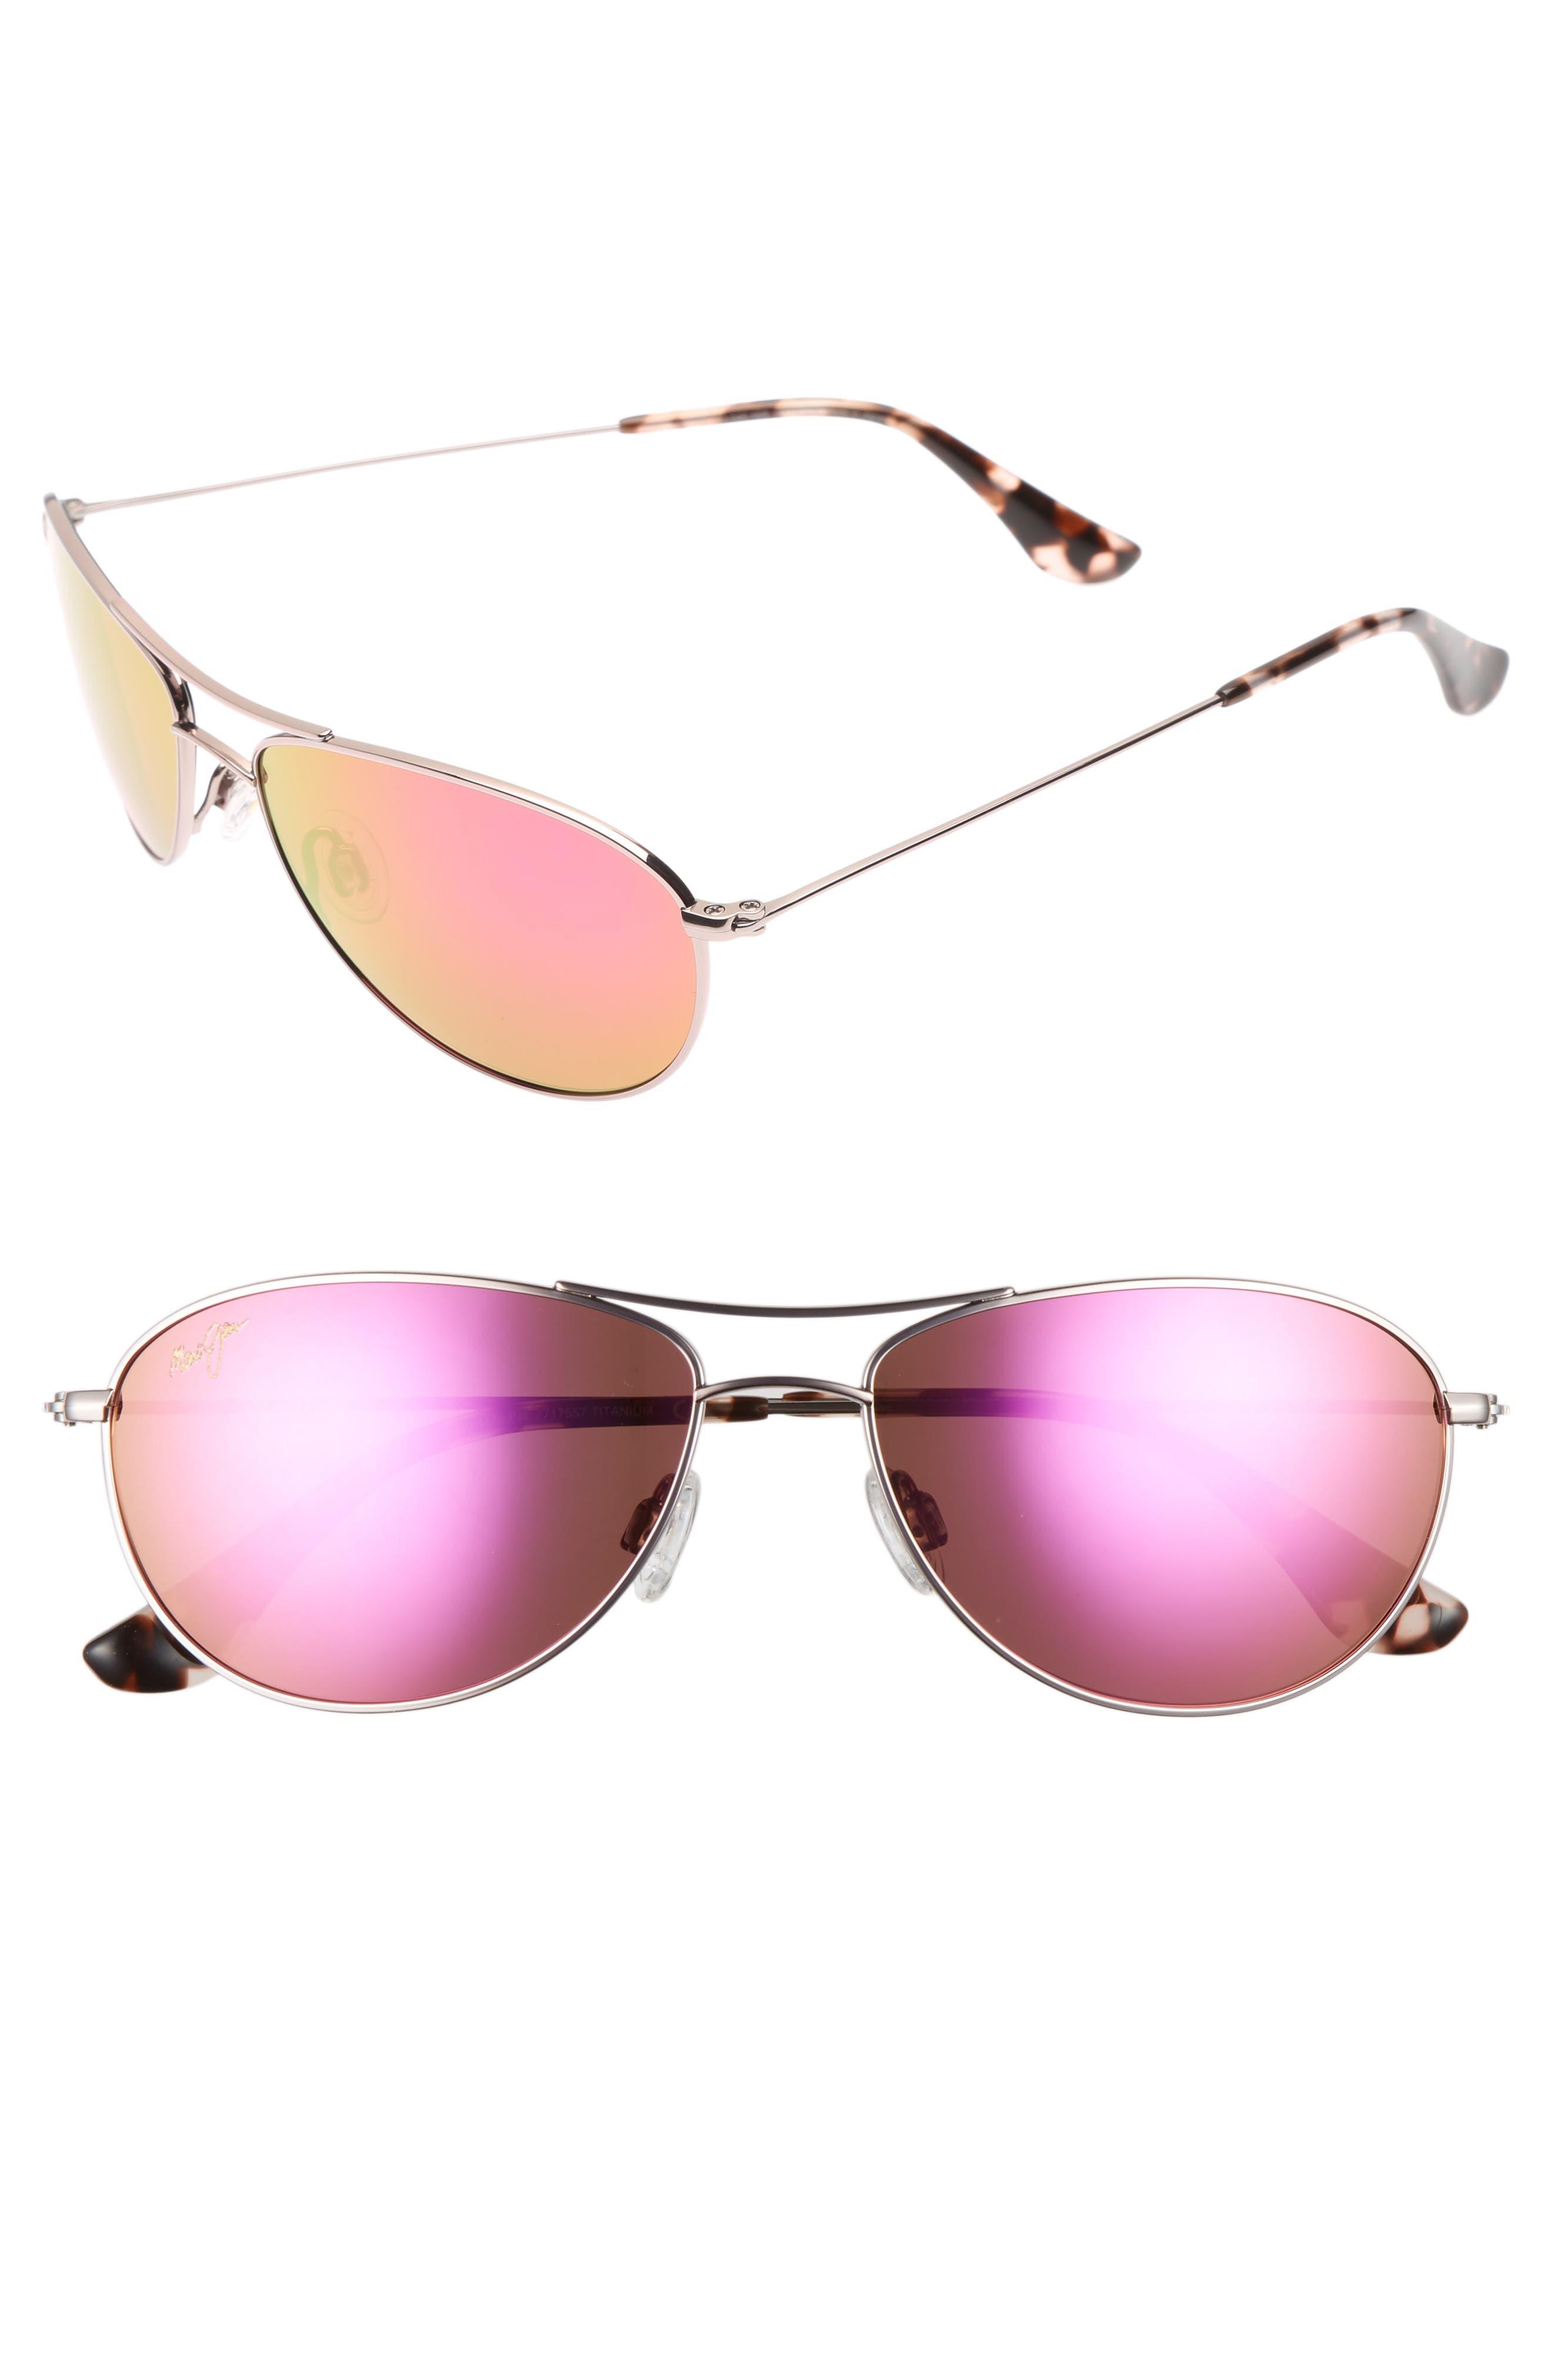 Baby Beach 56mm Mirrored PolarizedPlus2<sup>®</sup> Aviator Sunglasses,                         Main,                         color, ROSE GOLD/ MAUI SUNRISE